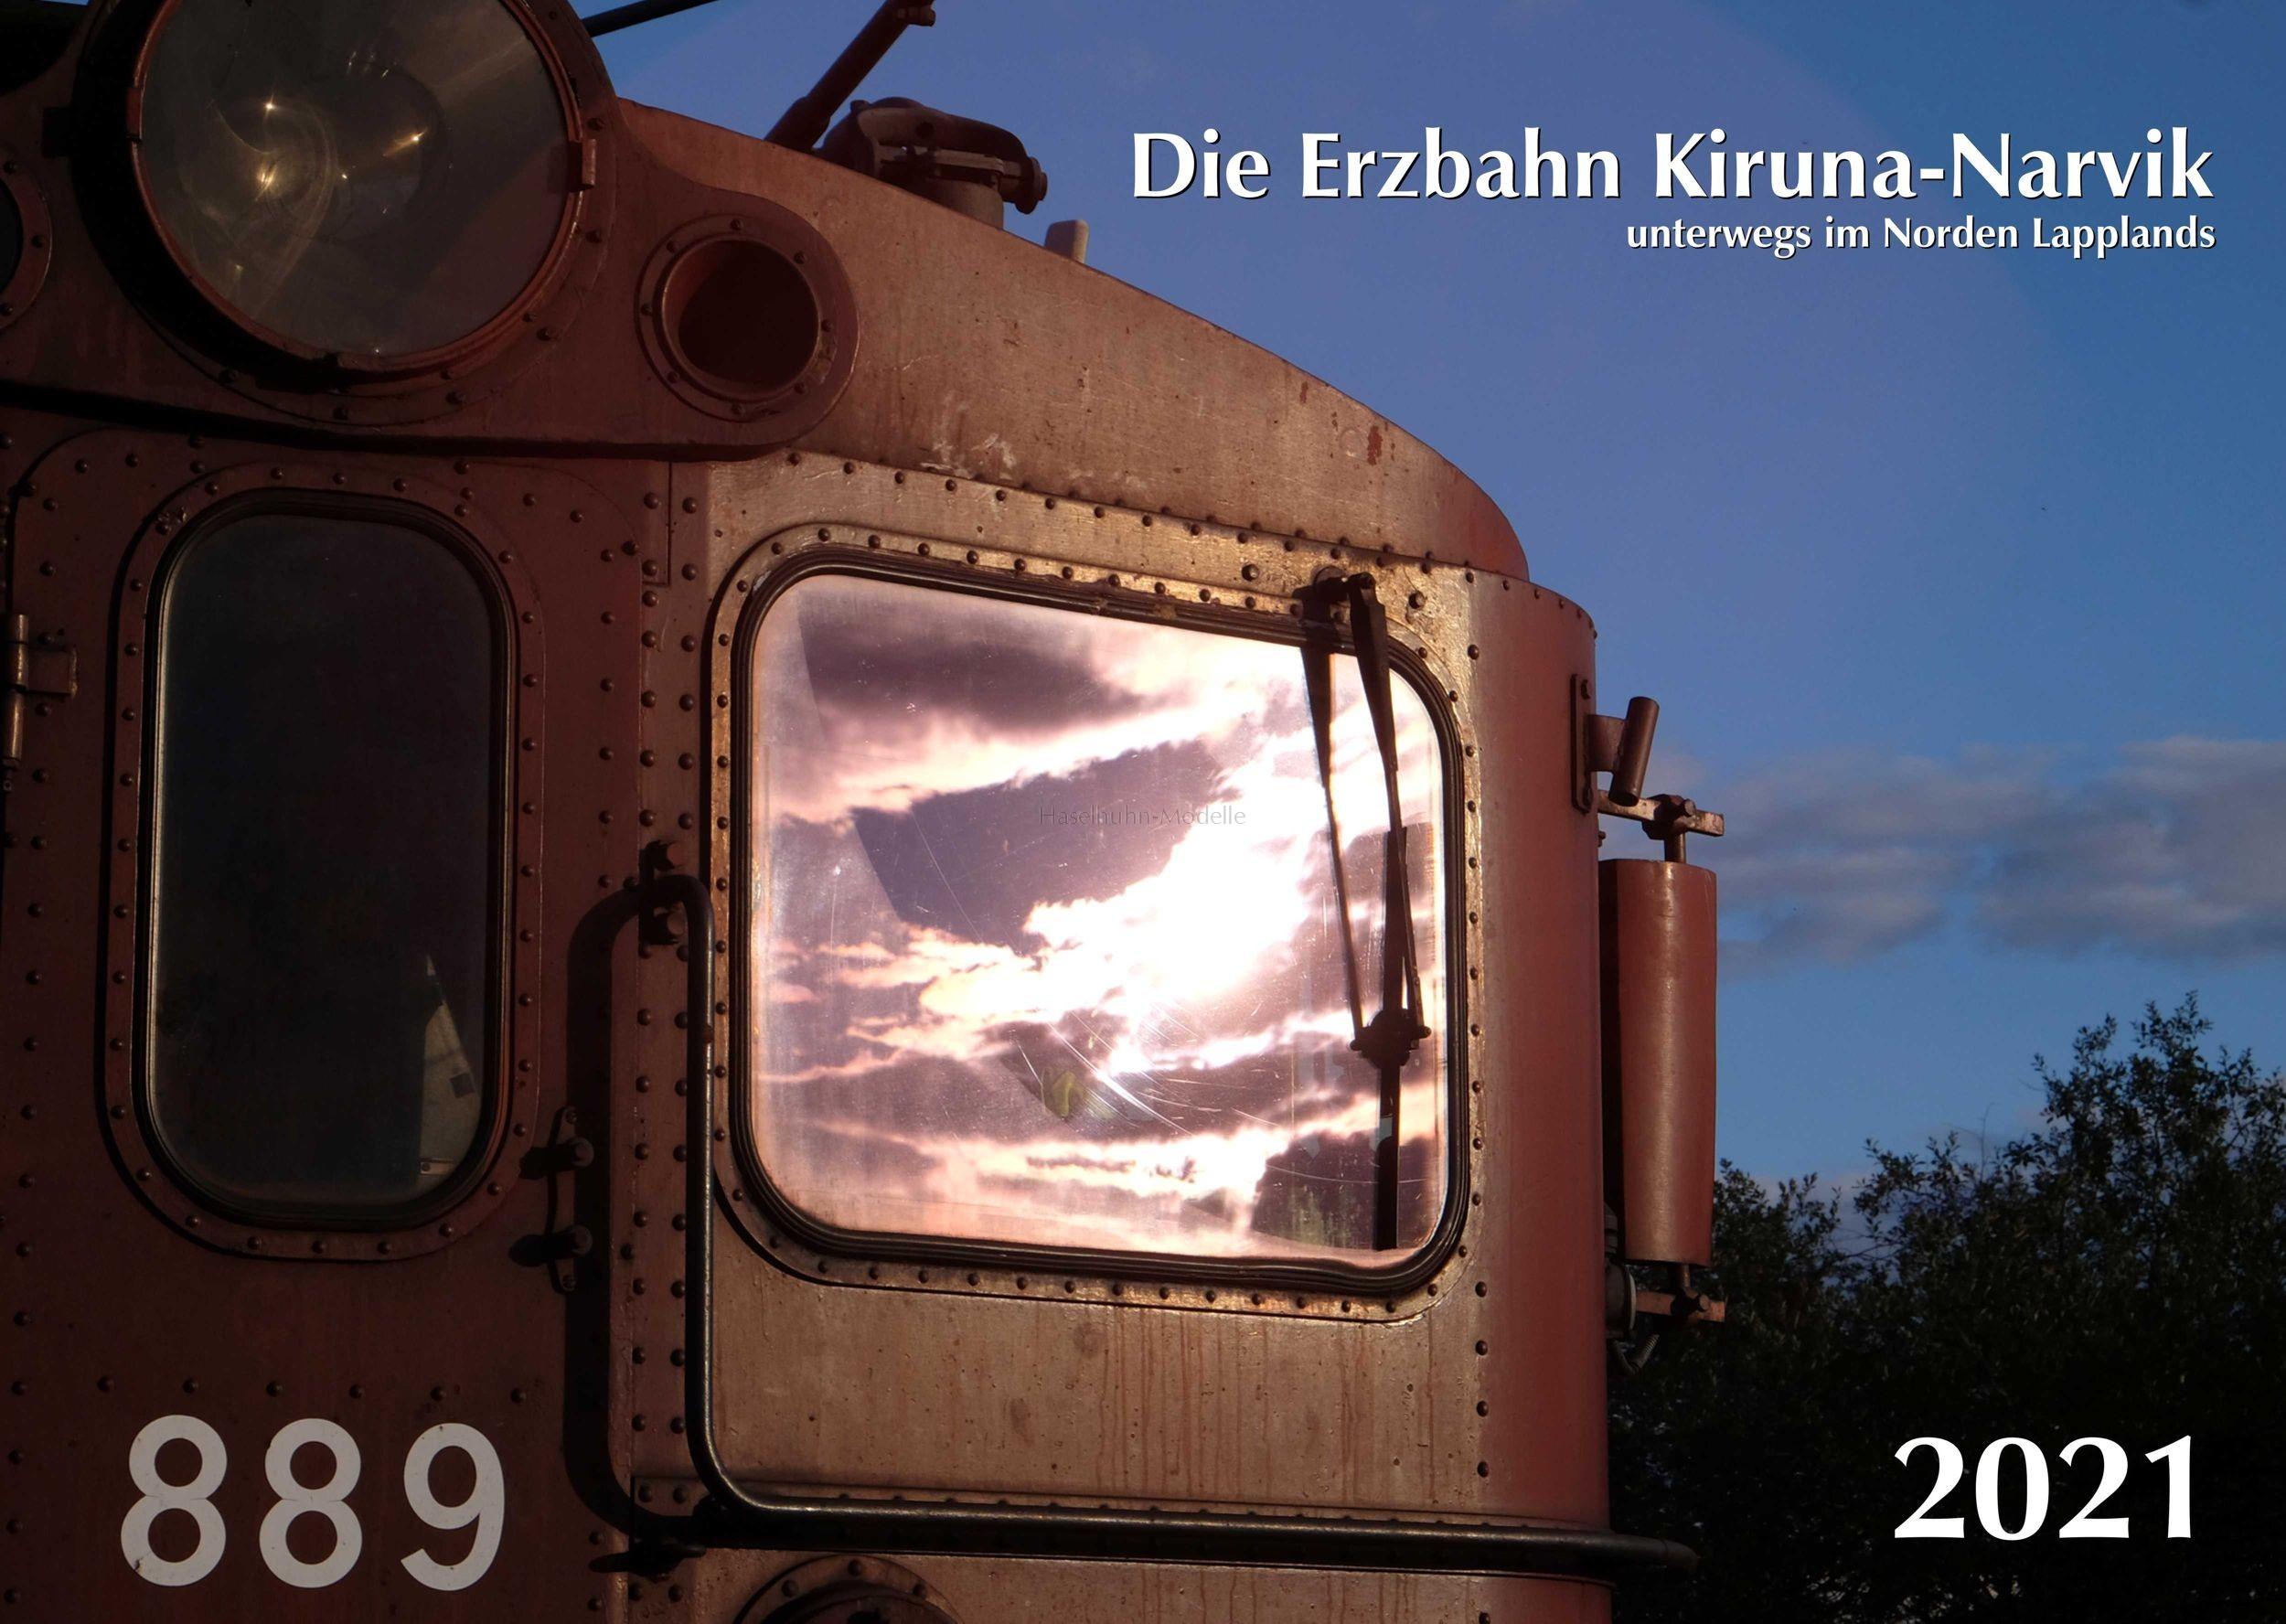 Erzbahn Kiruna-Narvik Kalender 2021 Deckblatt